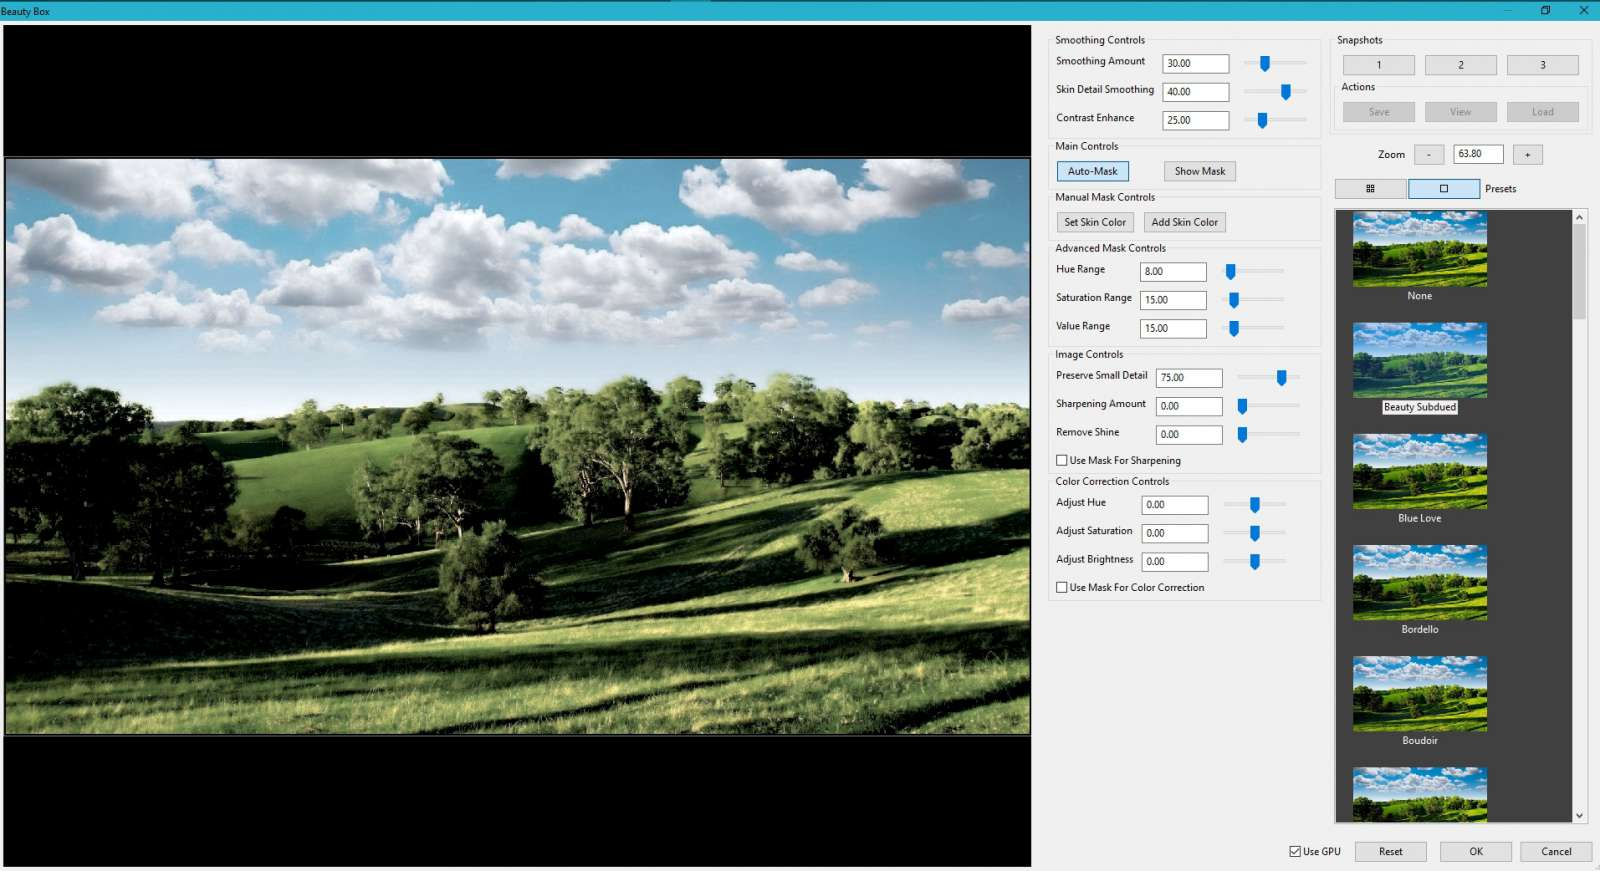 Ultimate Adobe Photoshop Plug-ins Bundle 2015.12 (2015)